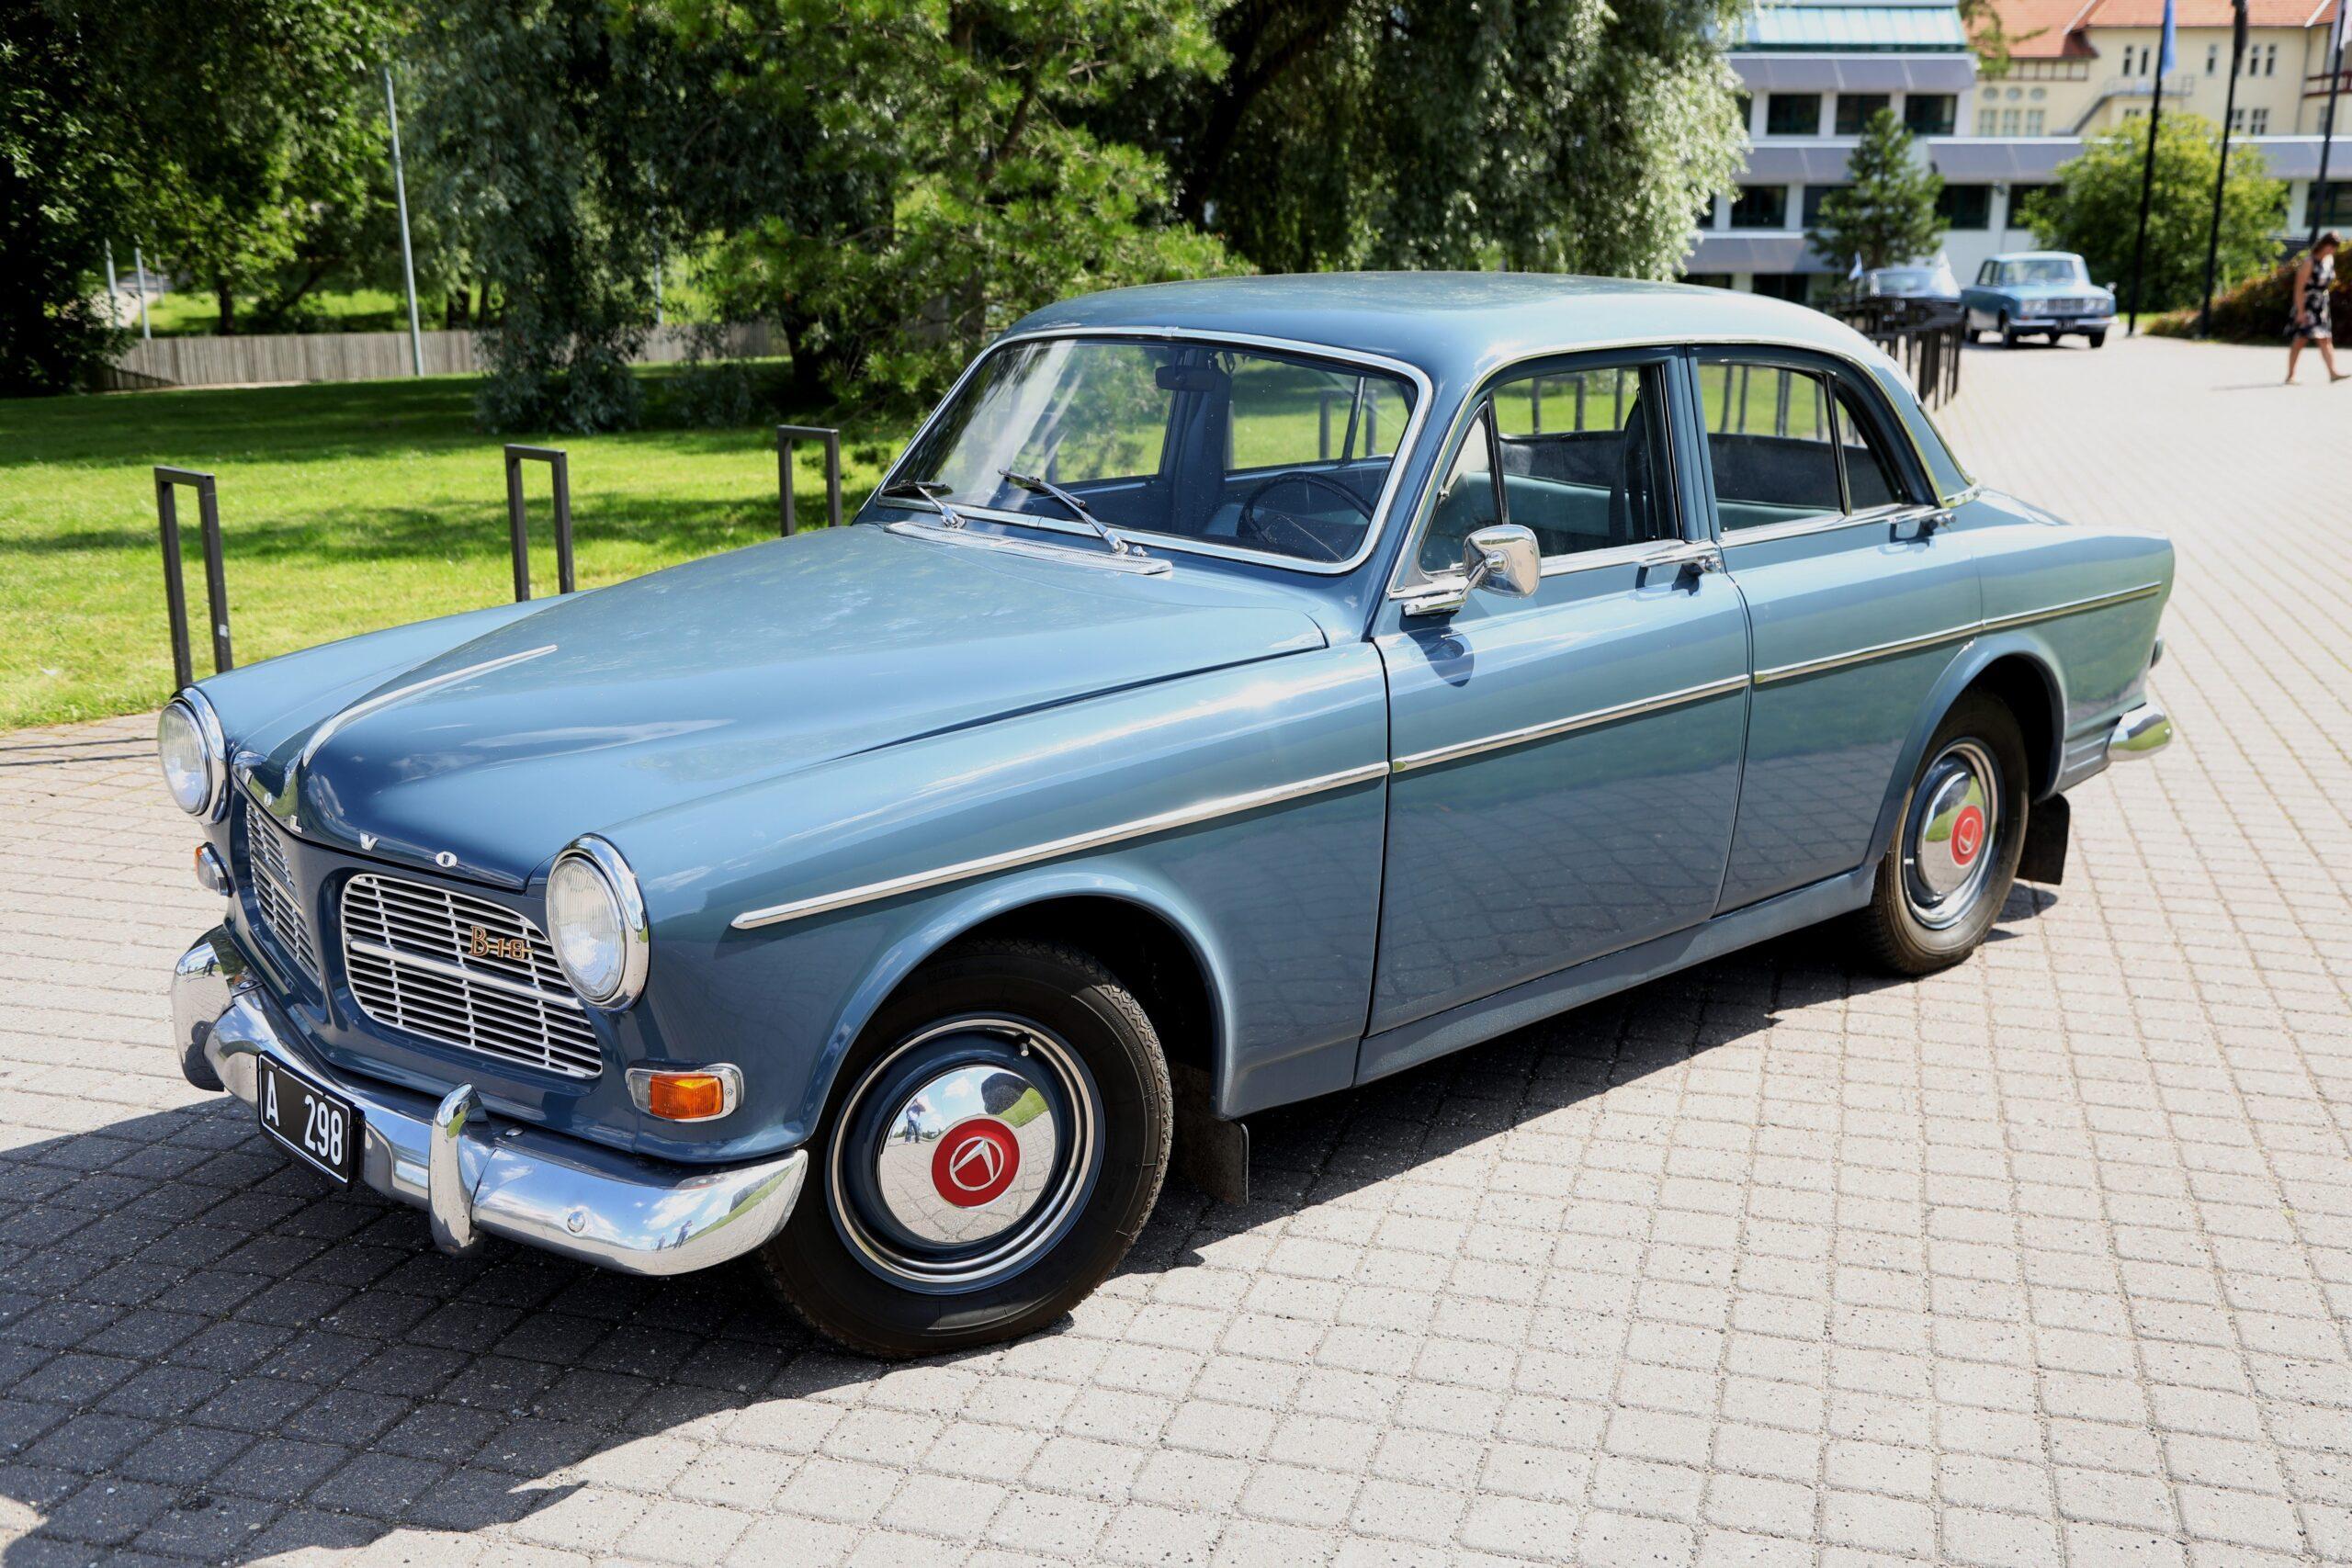 Esimene turvavöödega auto – Volvo Amazon